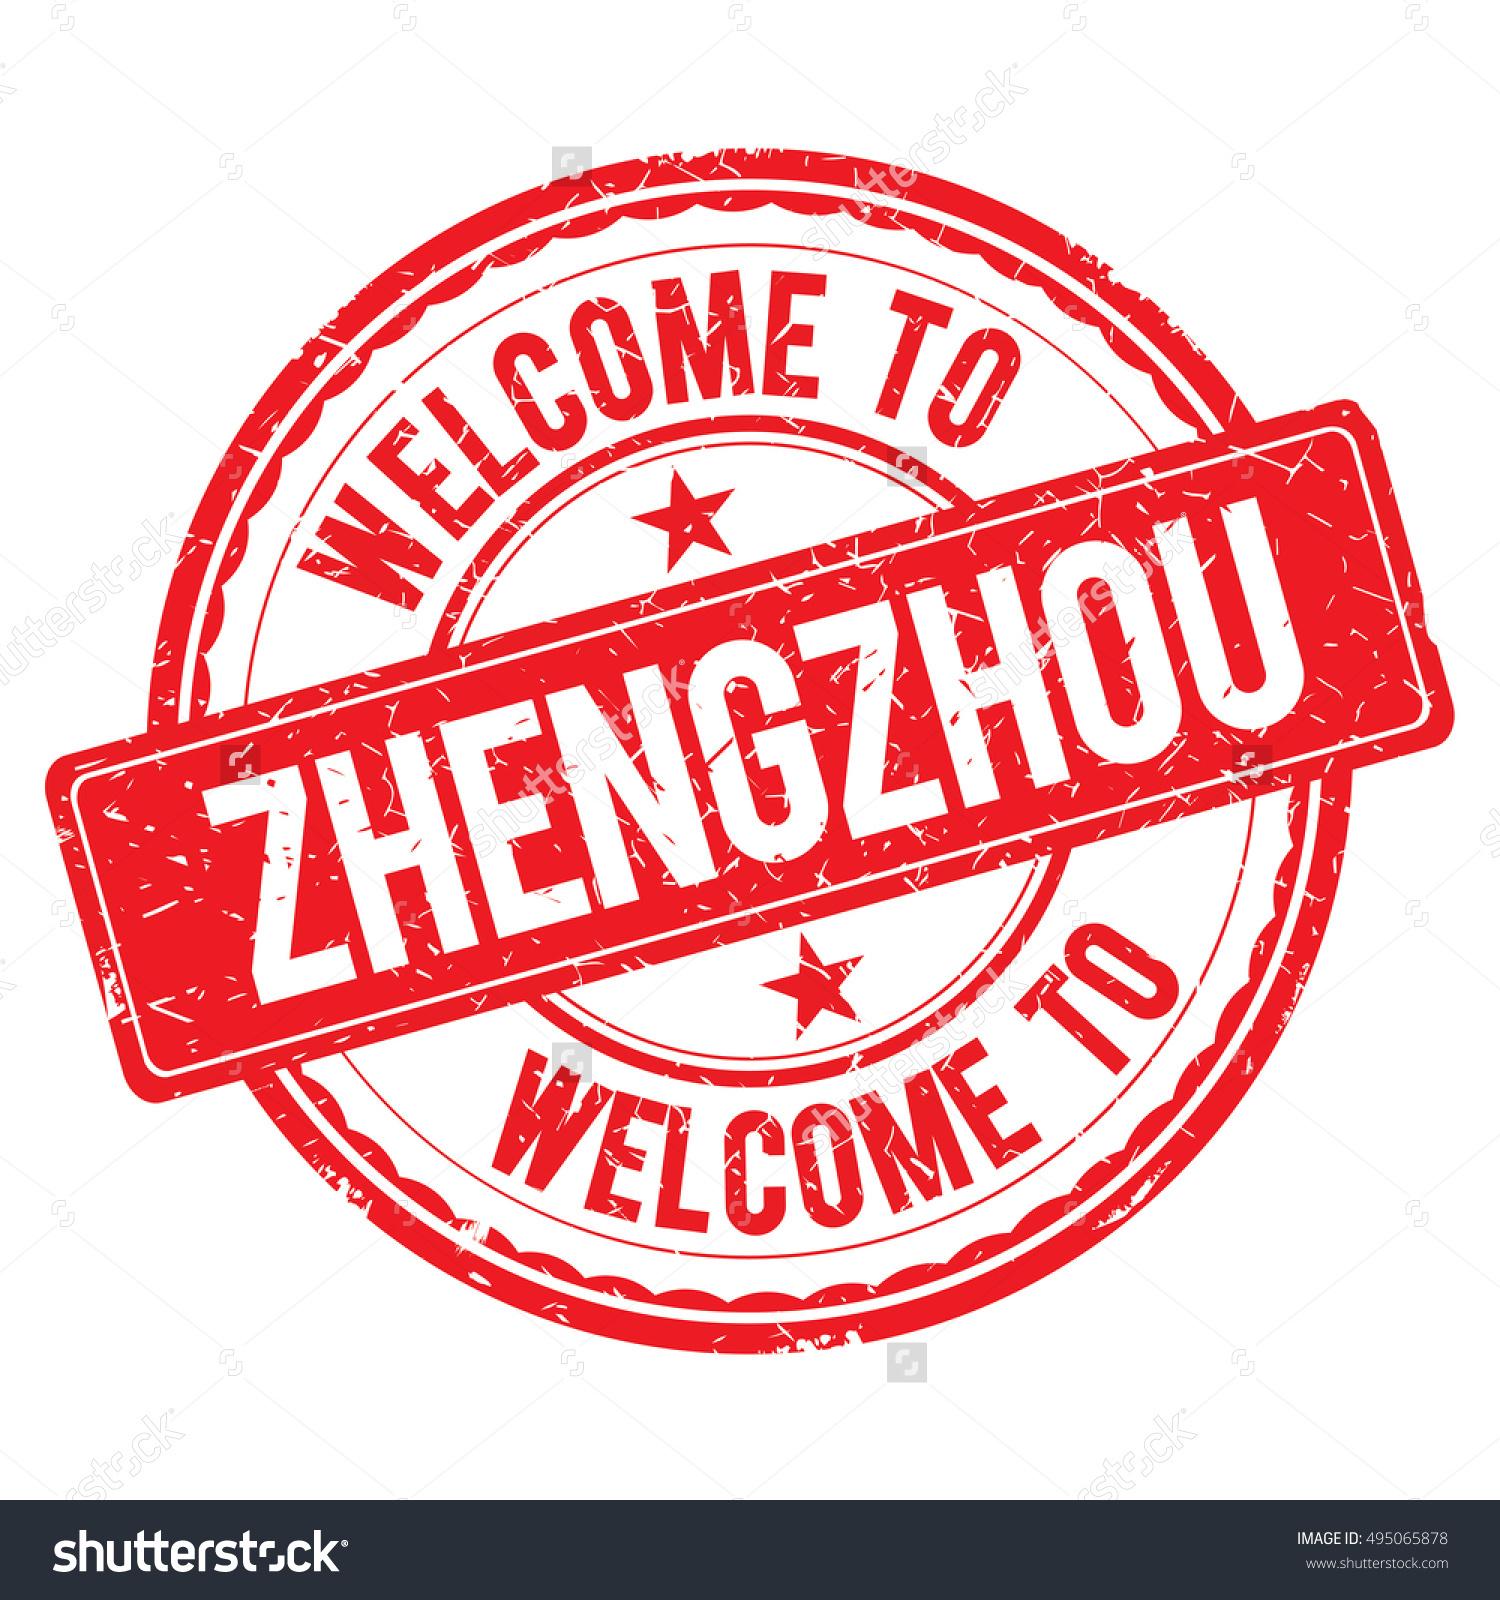 Zhengzhou Welcome Stamp Sign Illustration Stock Vector 495065878.